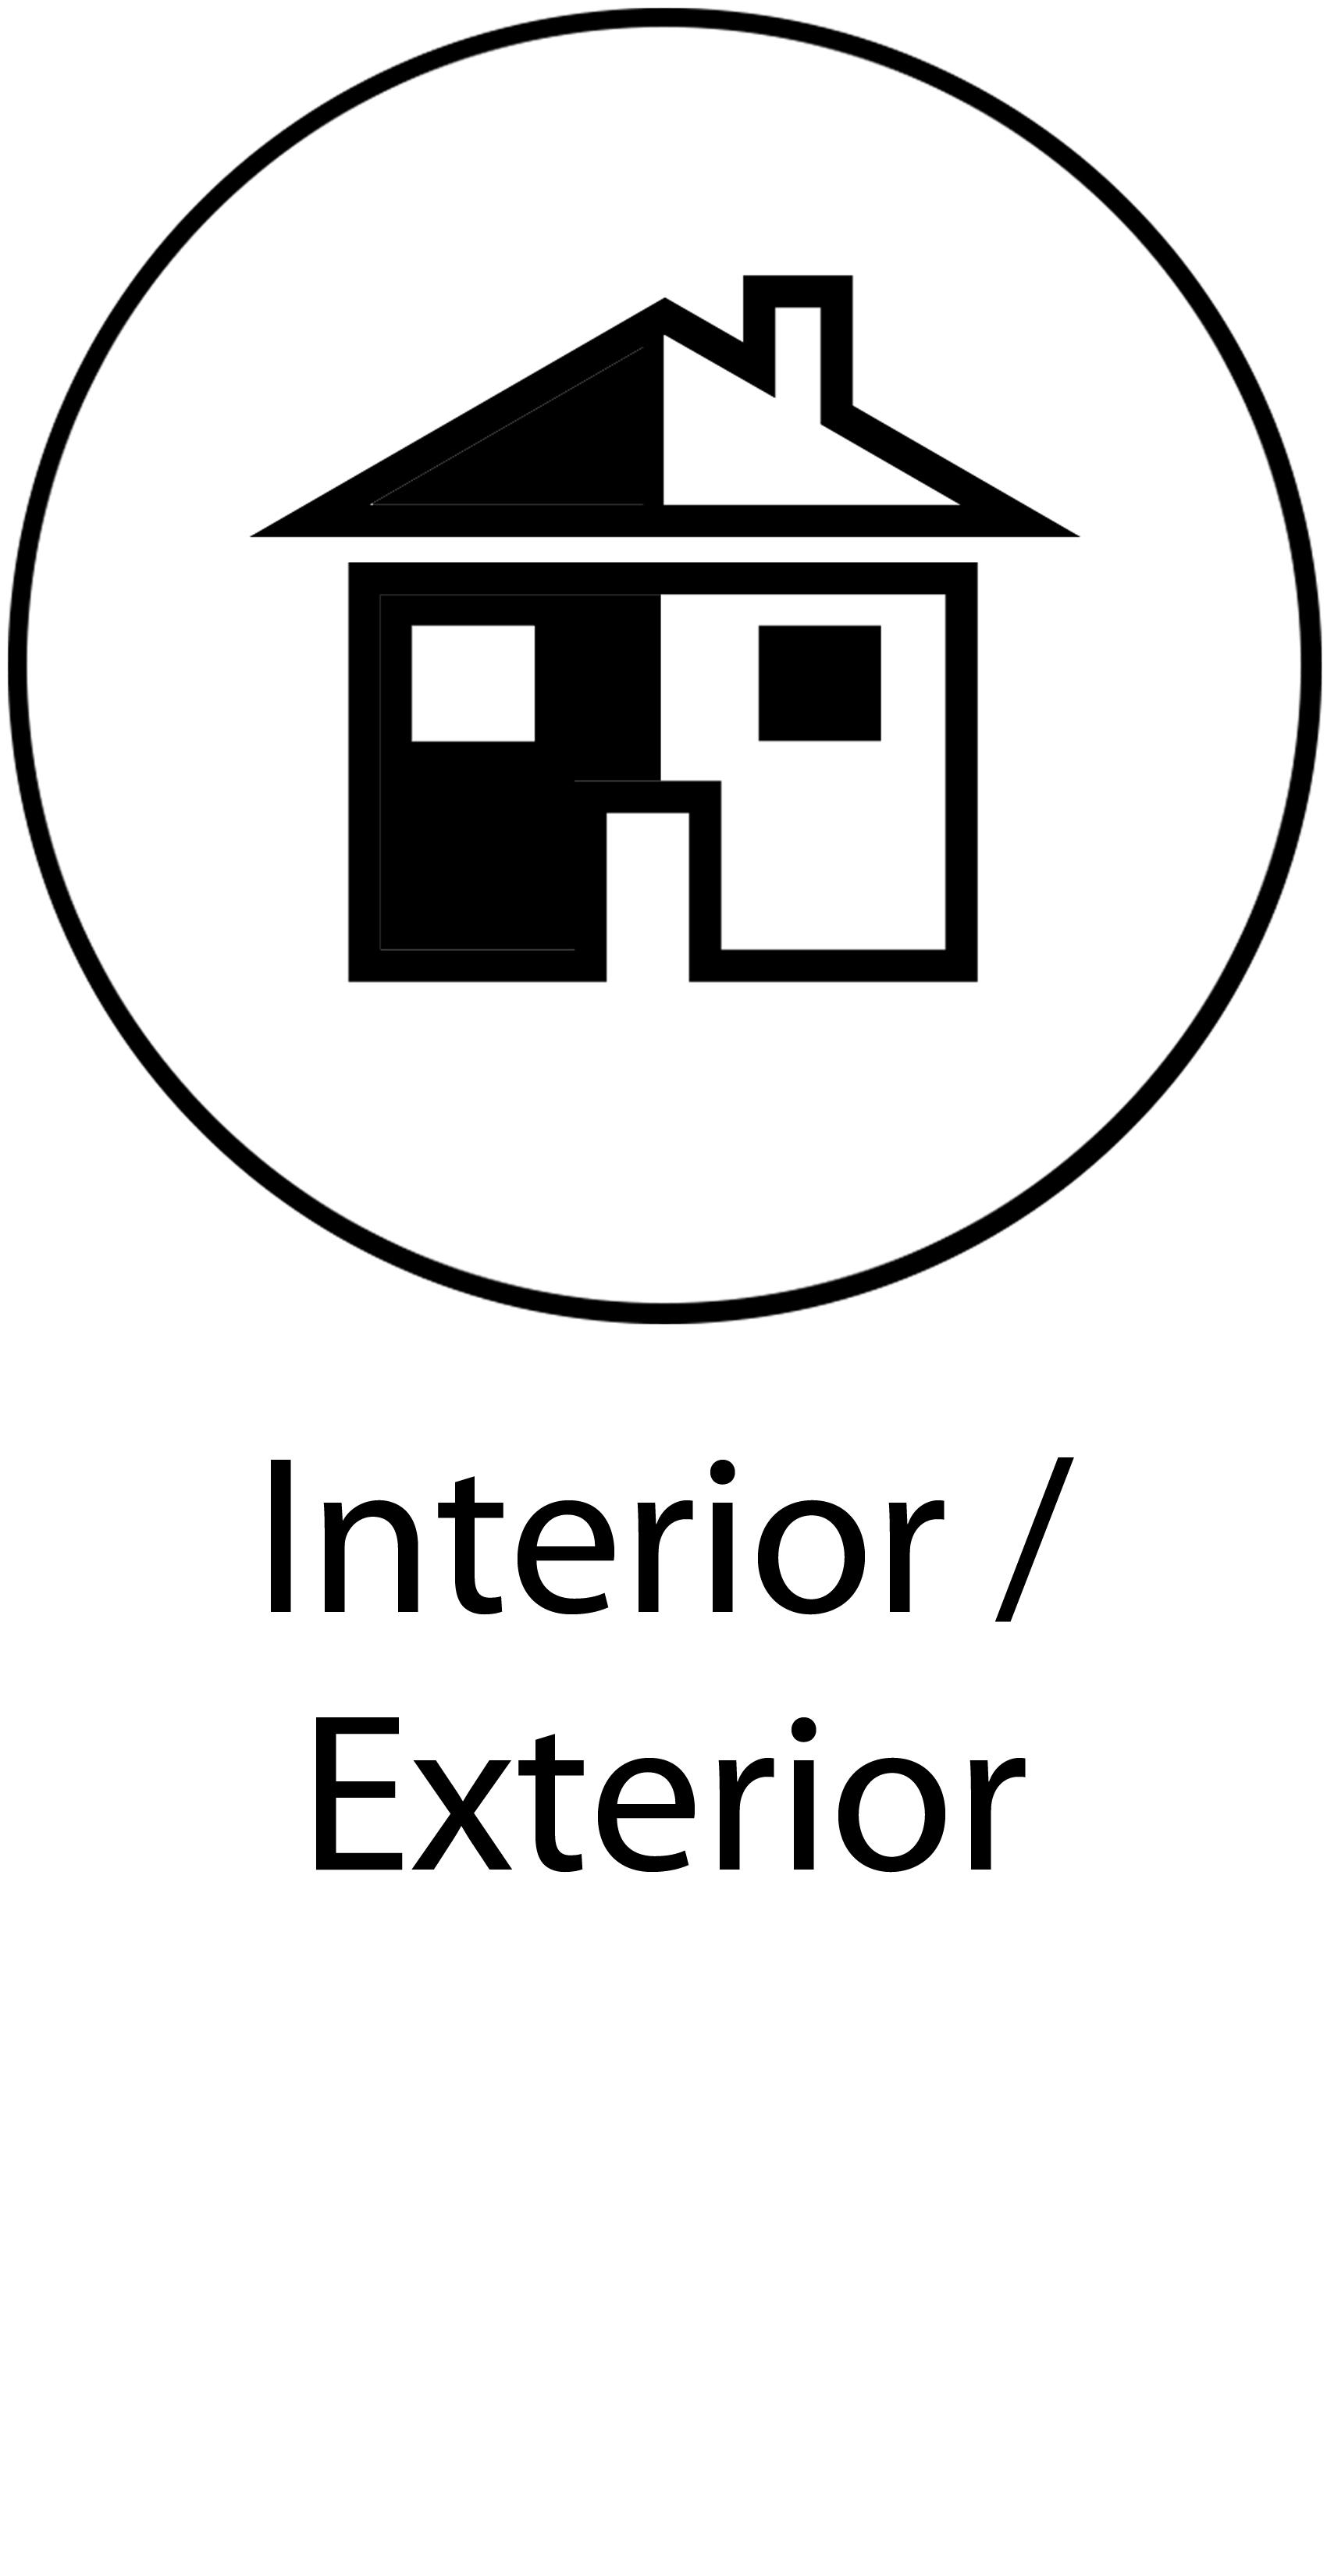 Interior Exterior.jpg